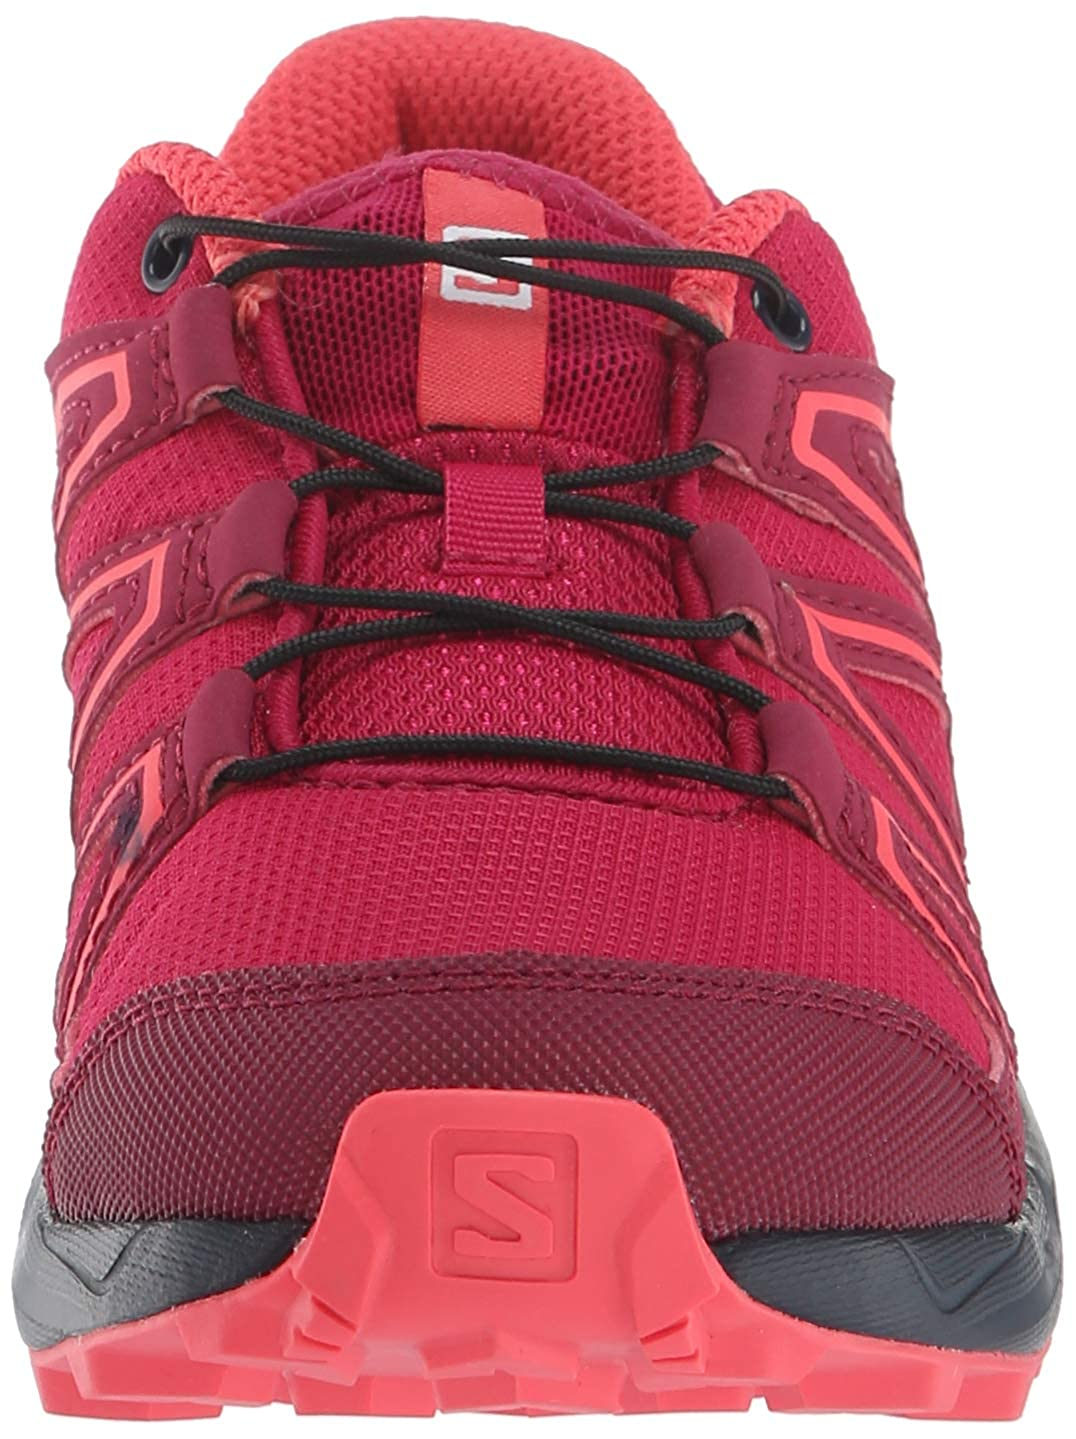 Salomon Unisex-Kids Speedcross J Trail Running Shoe